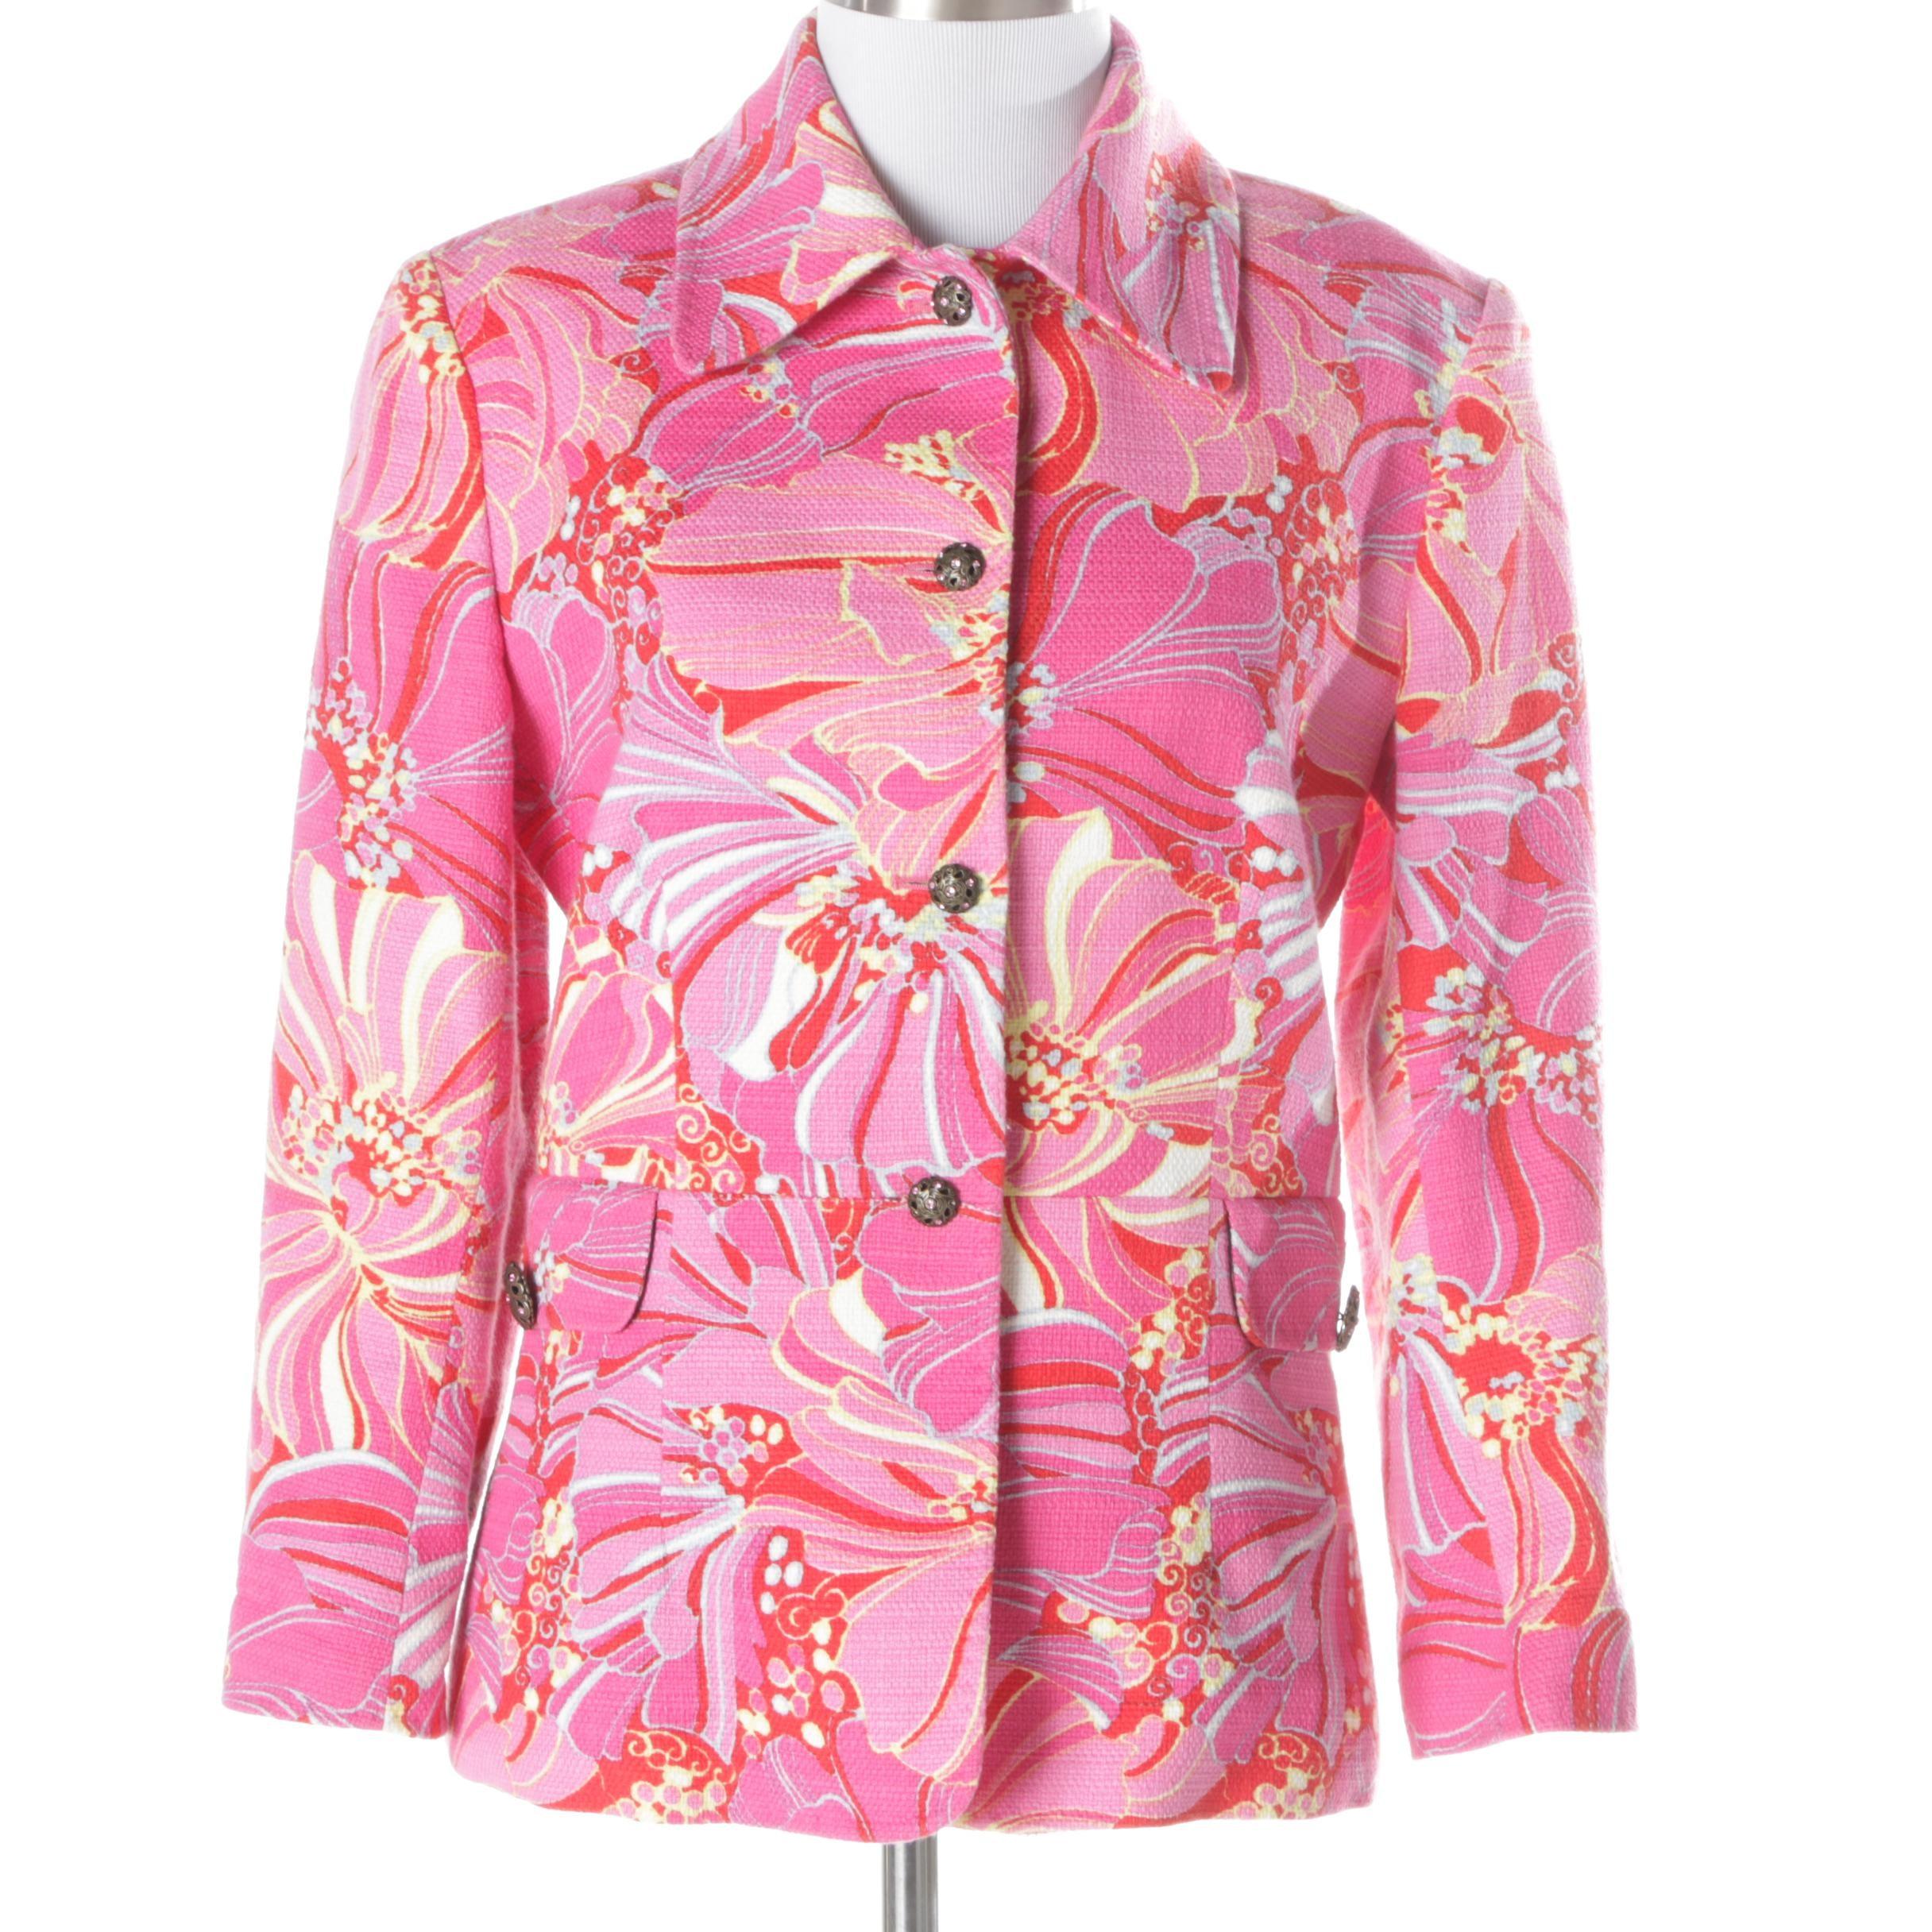 Women's Dolce & Gabbana Cotton Blend Floral Jacket